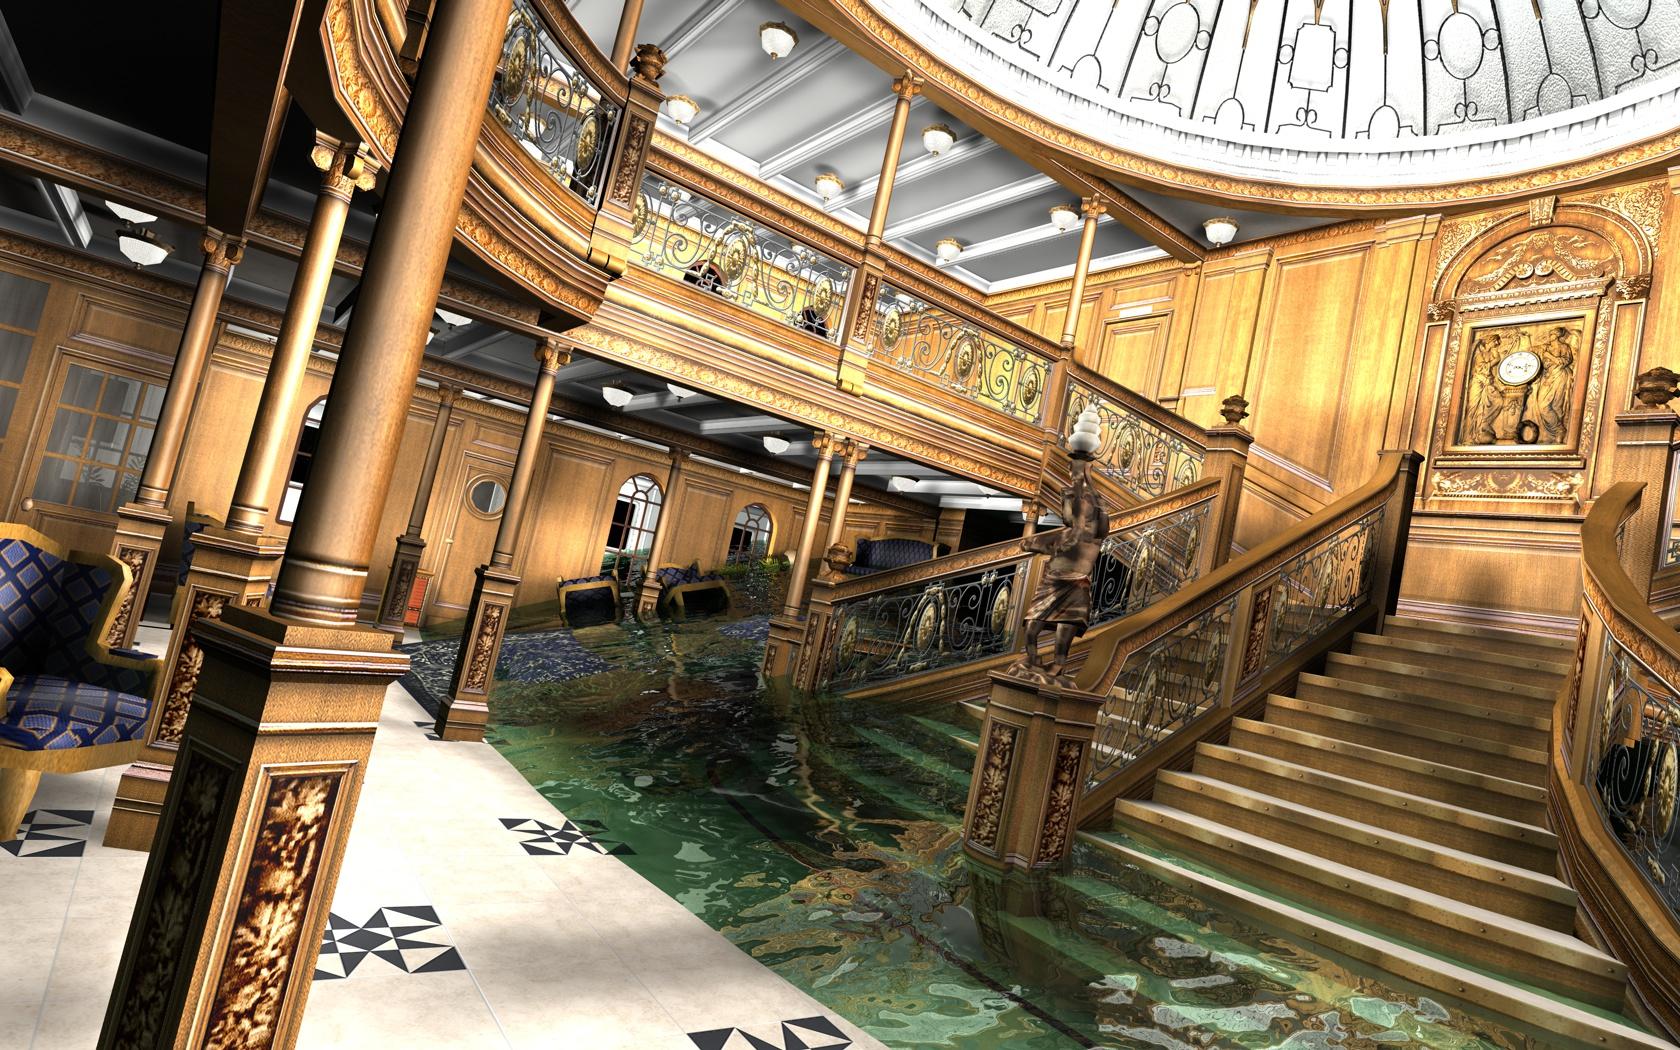 Renders Of Sinking Gsc Image Mafia Titanic Mod For Mafia